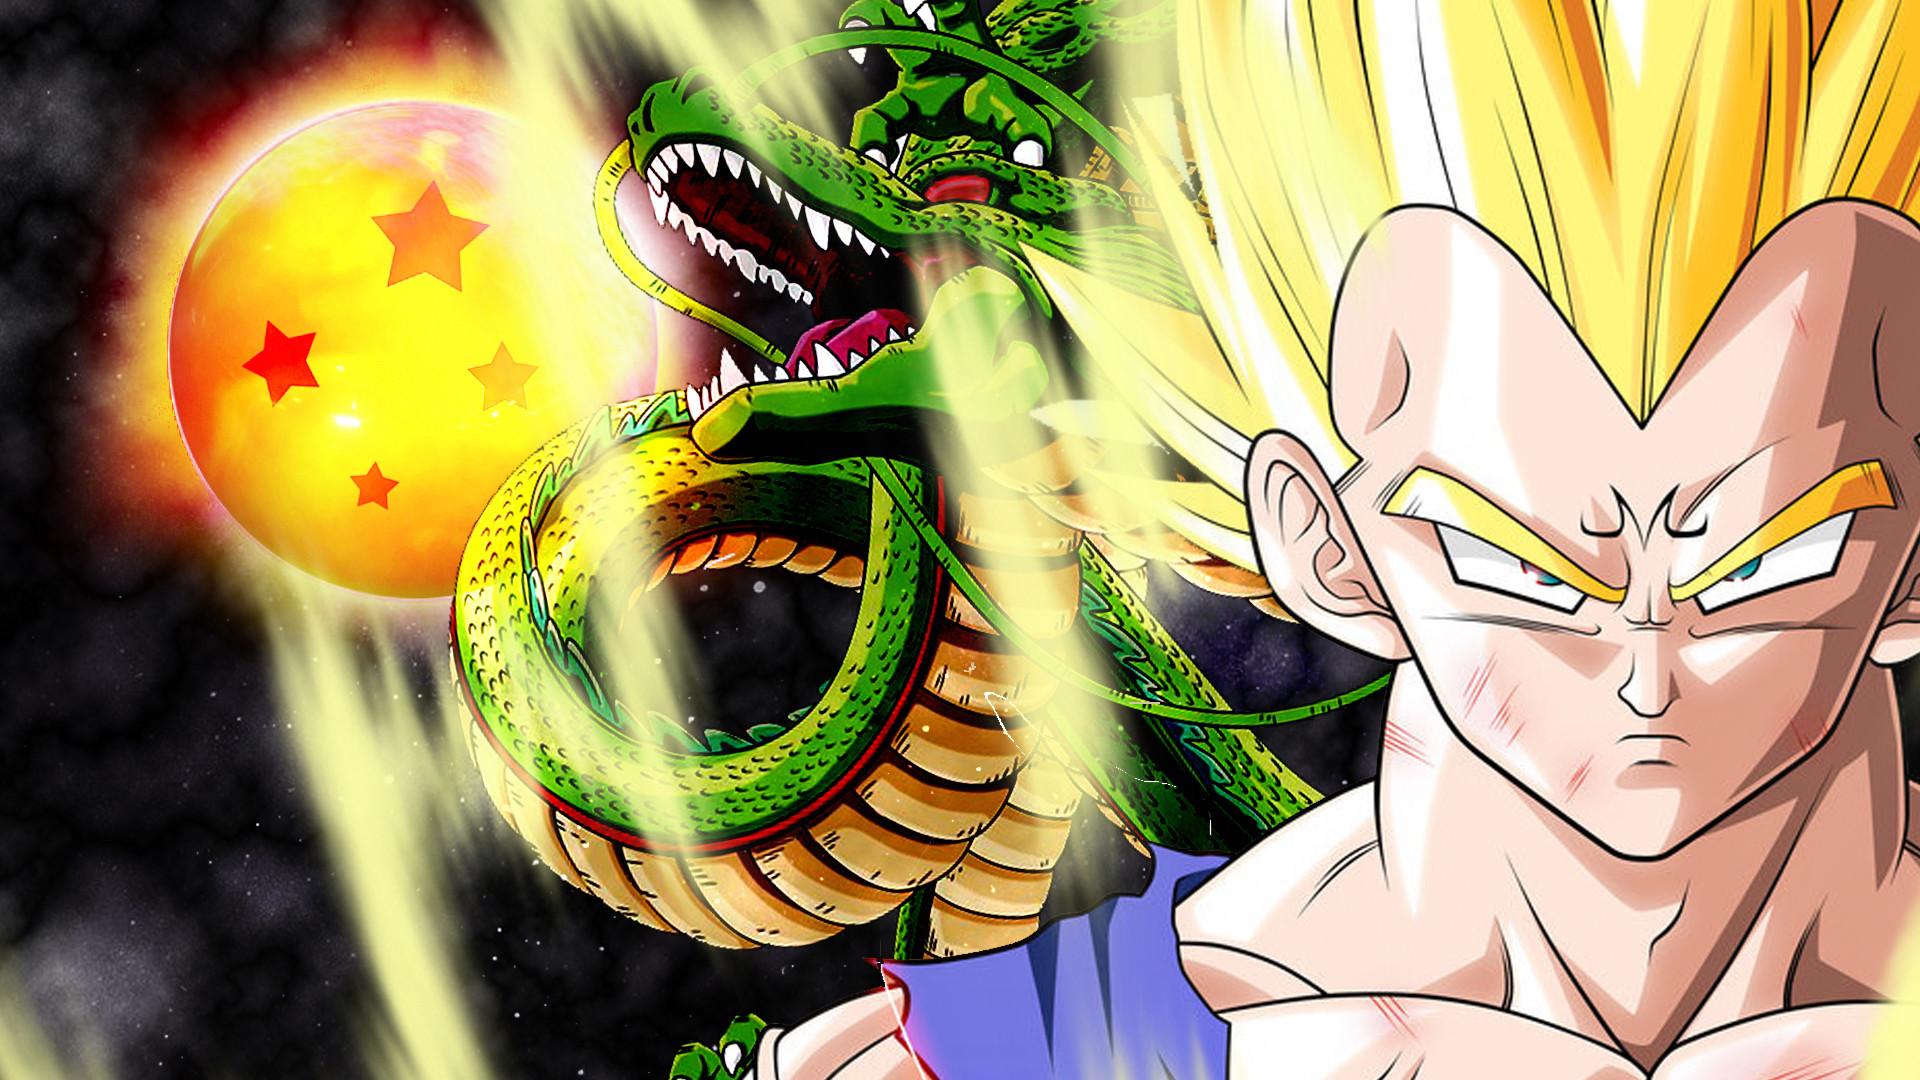 Epic Dbz Wallpapers High Resolution: Dbz Wallpaper Goku And Vegeta (76+ Images